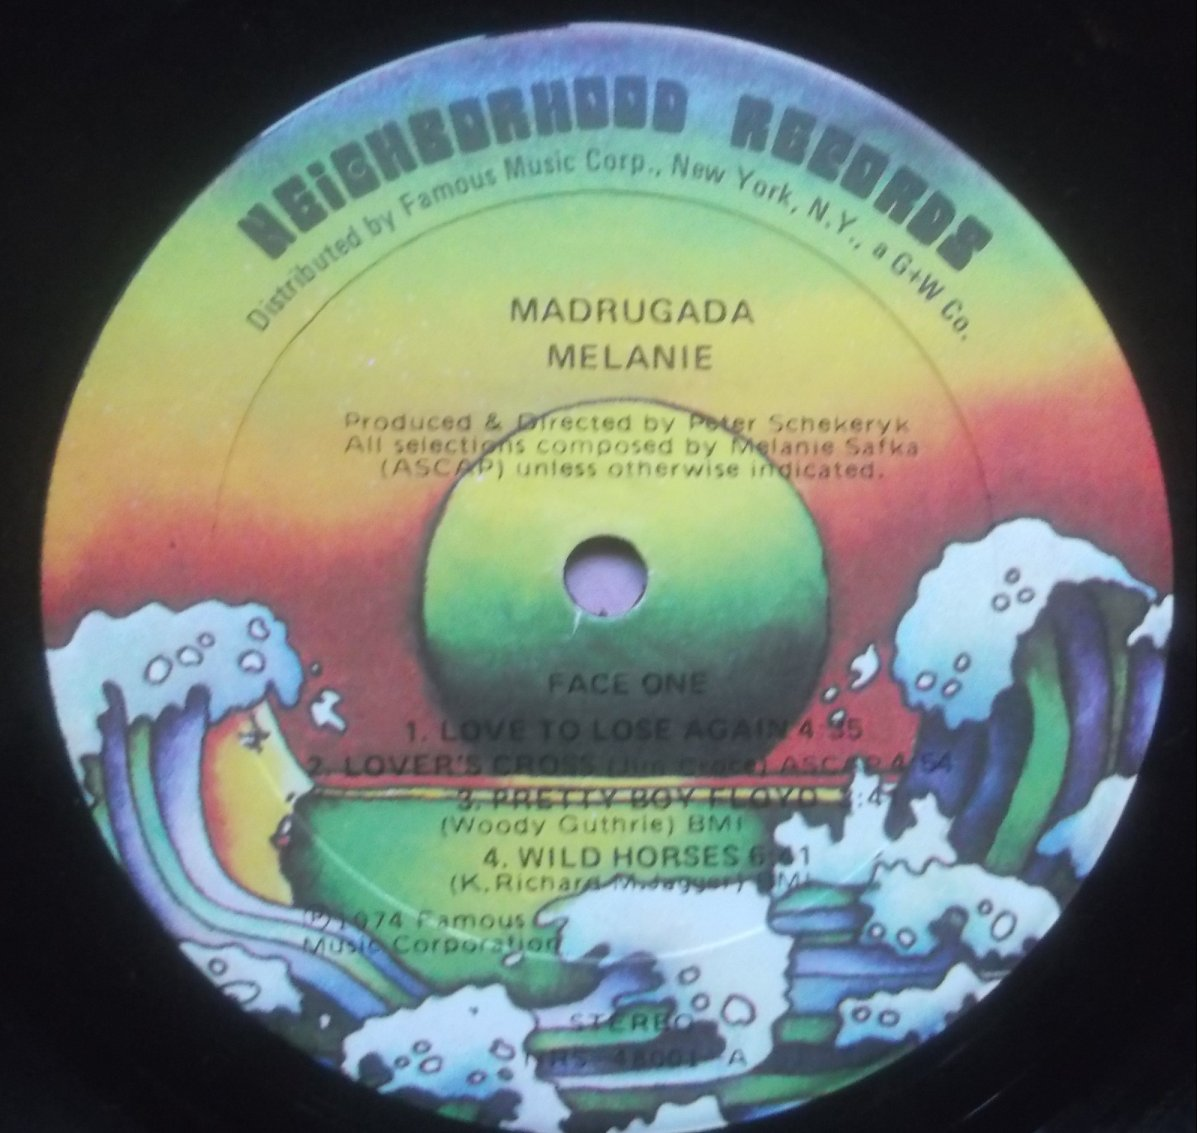 Melanie – Madrugada